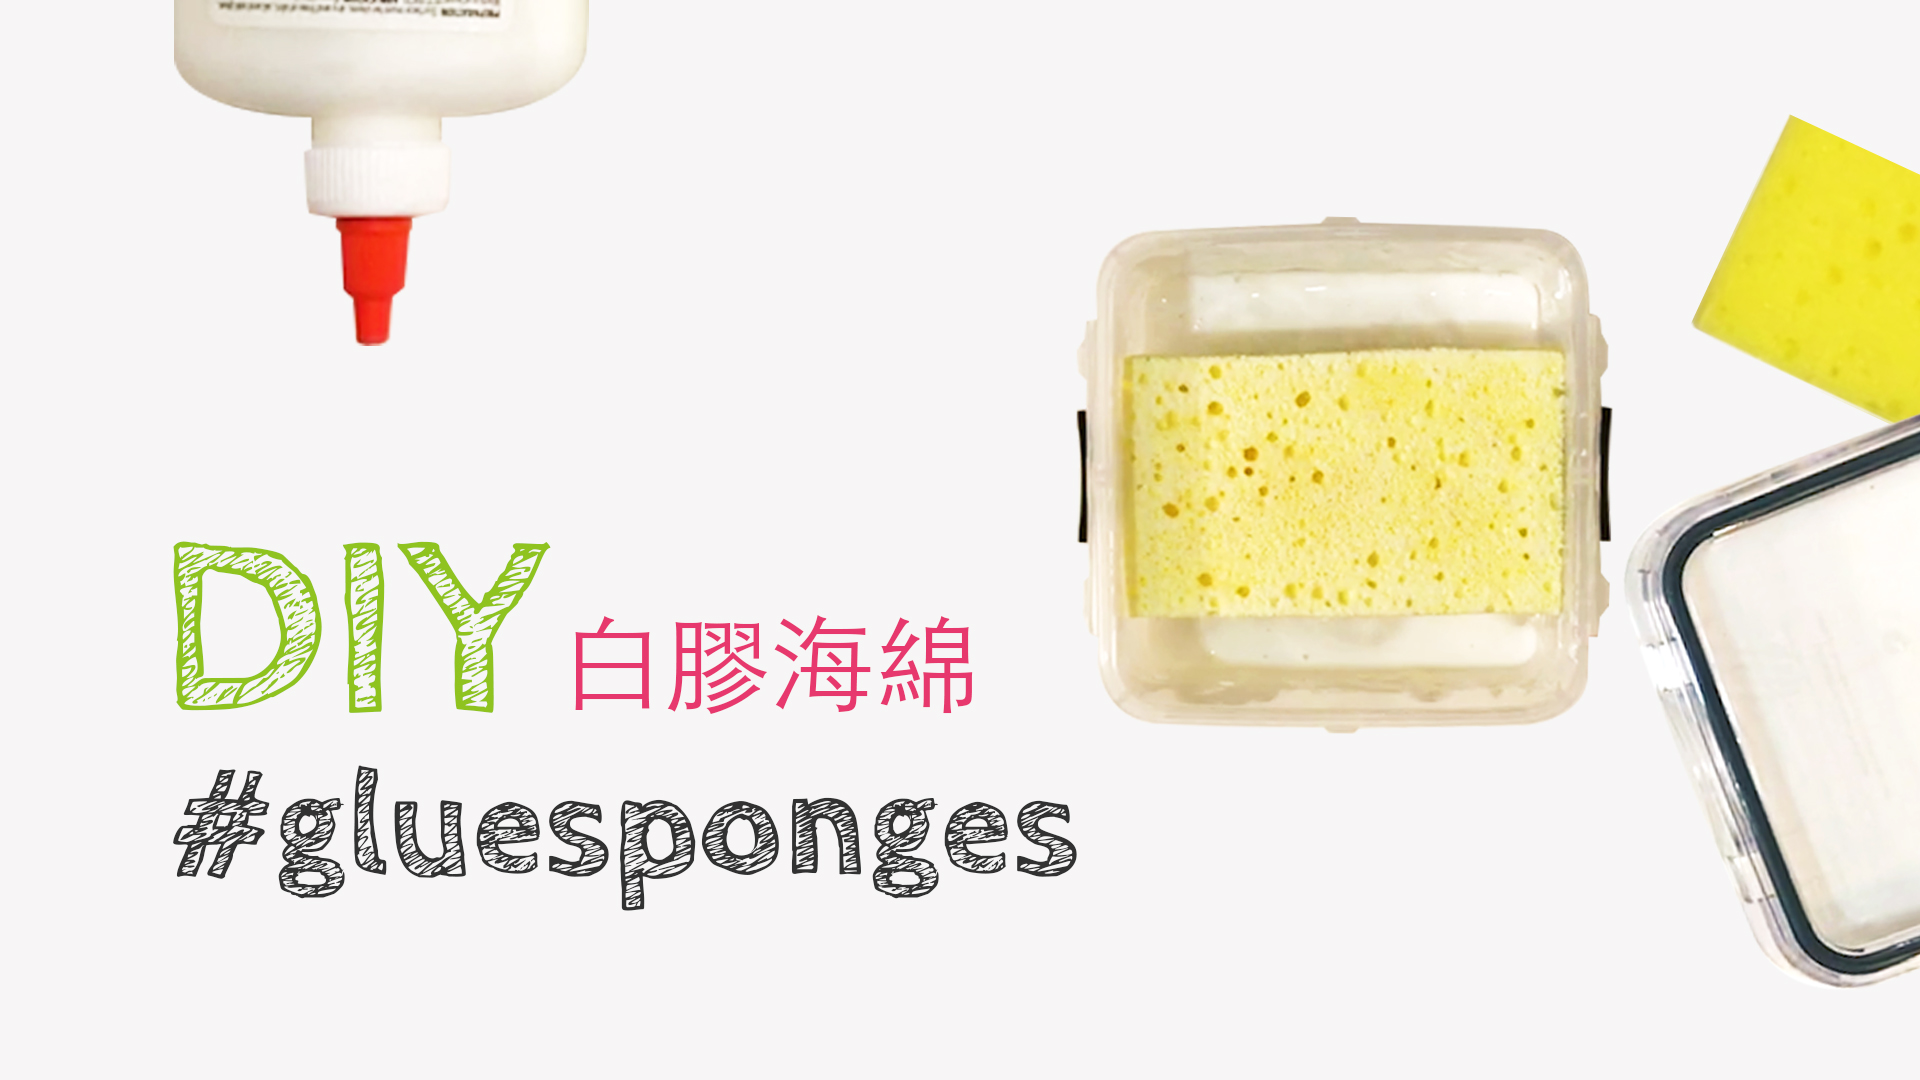 DIY 白膠海綿 Glue Sponge